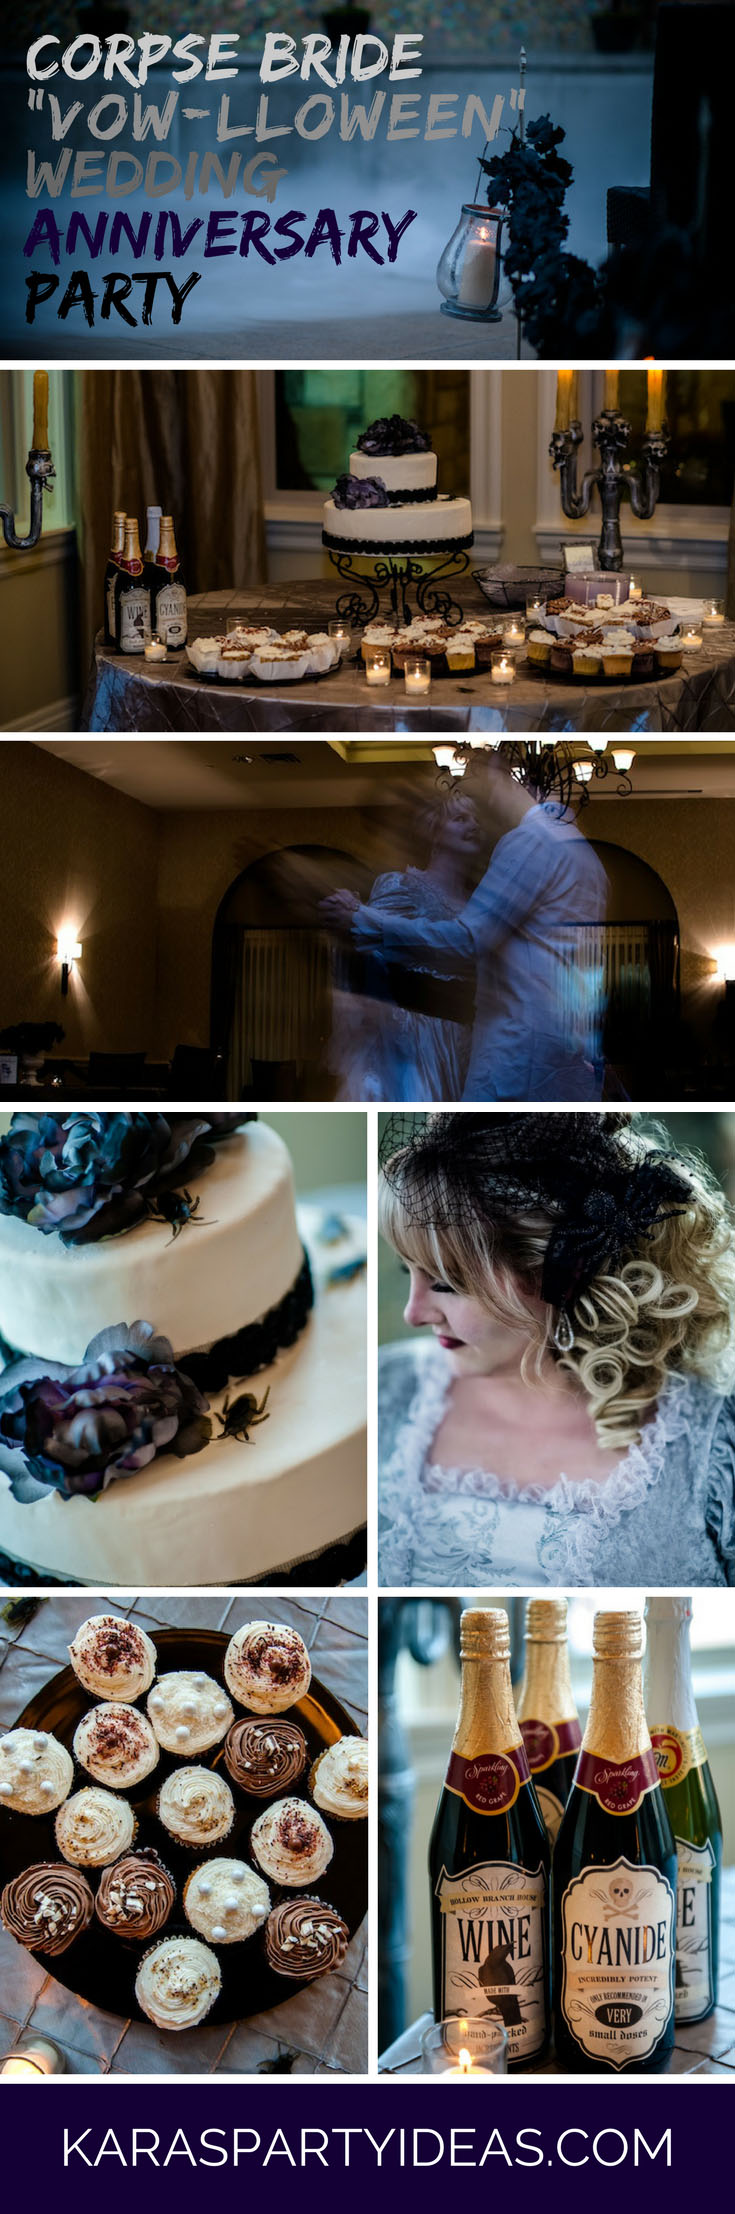 wedding anniversary parties ideas